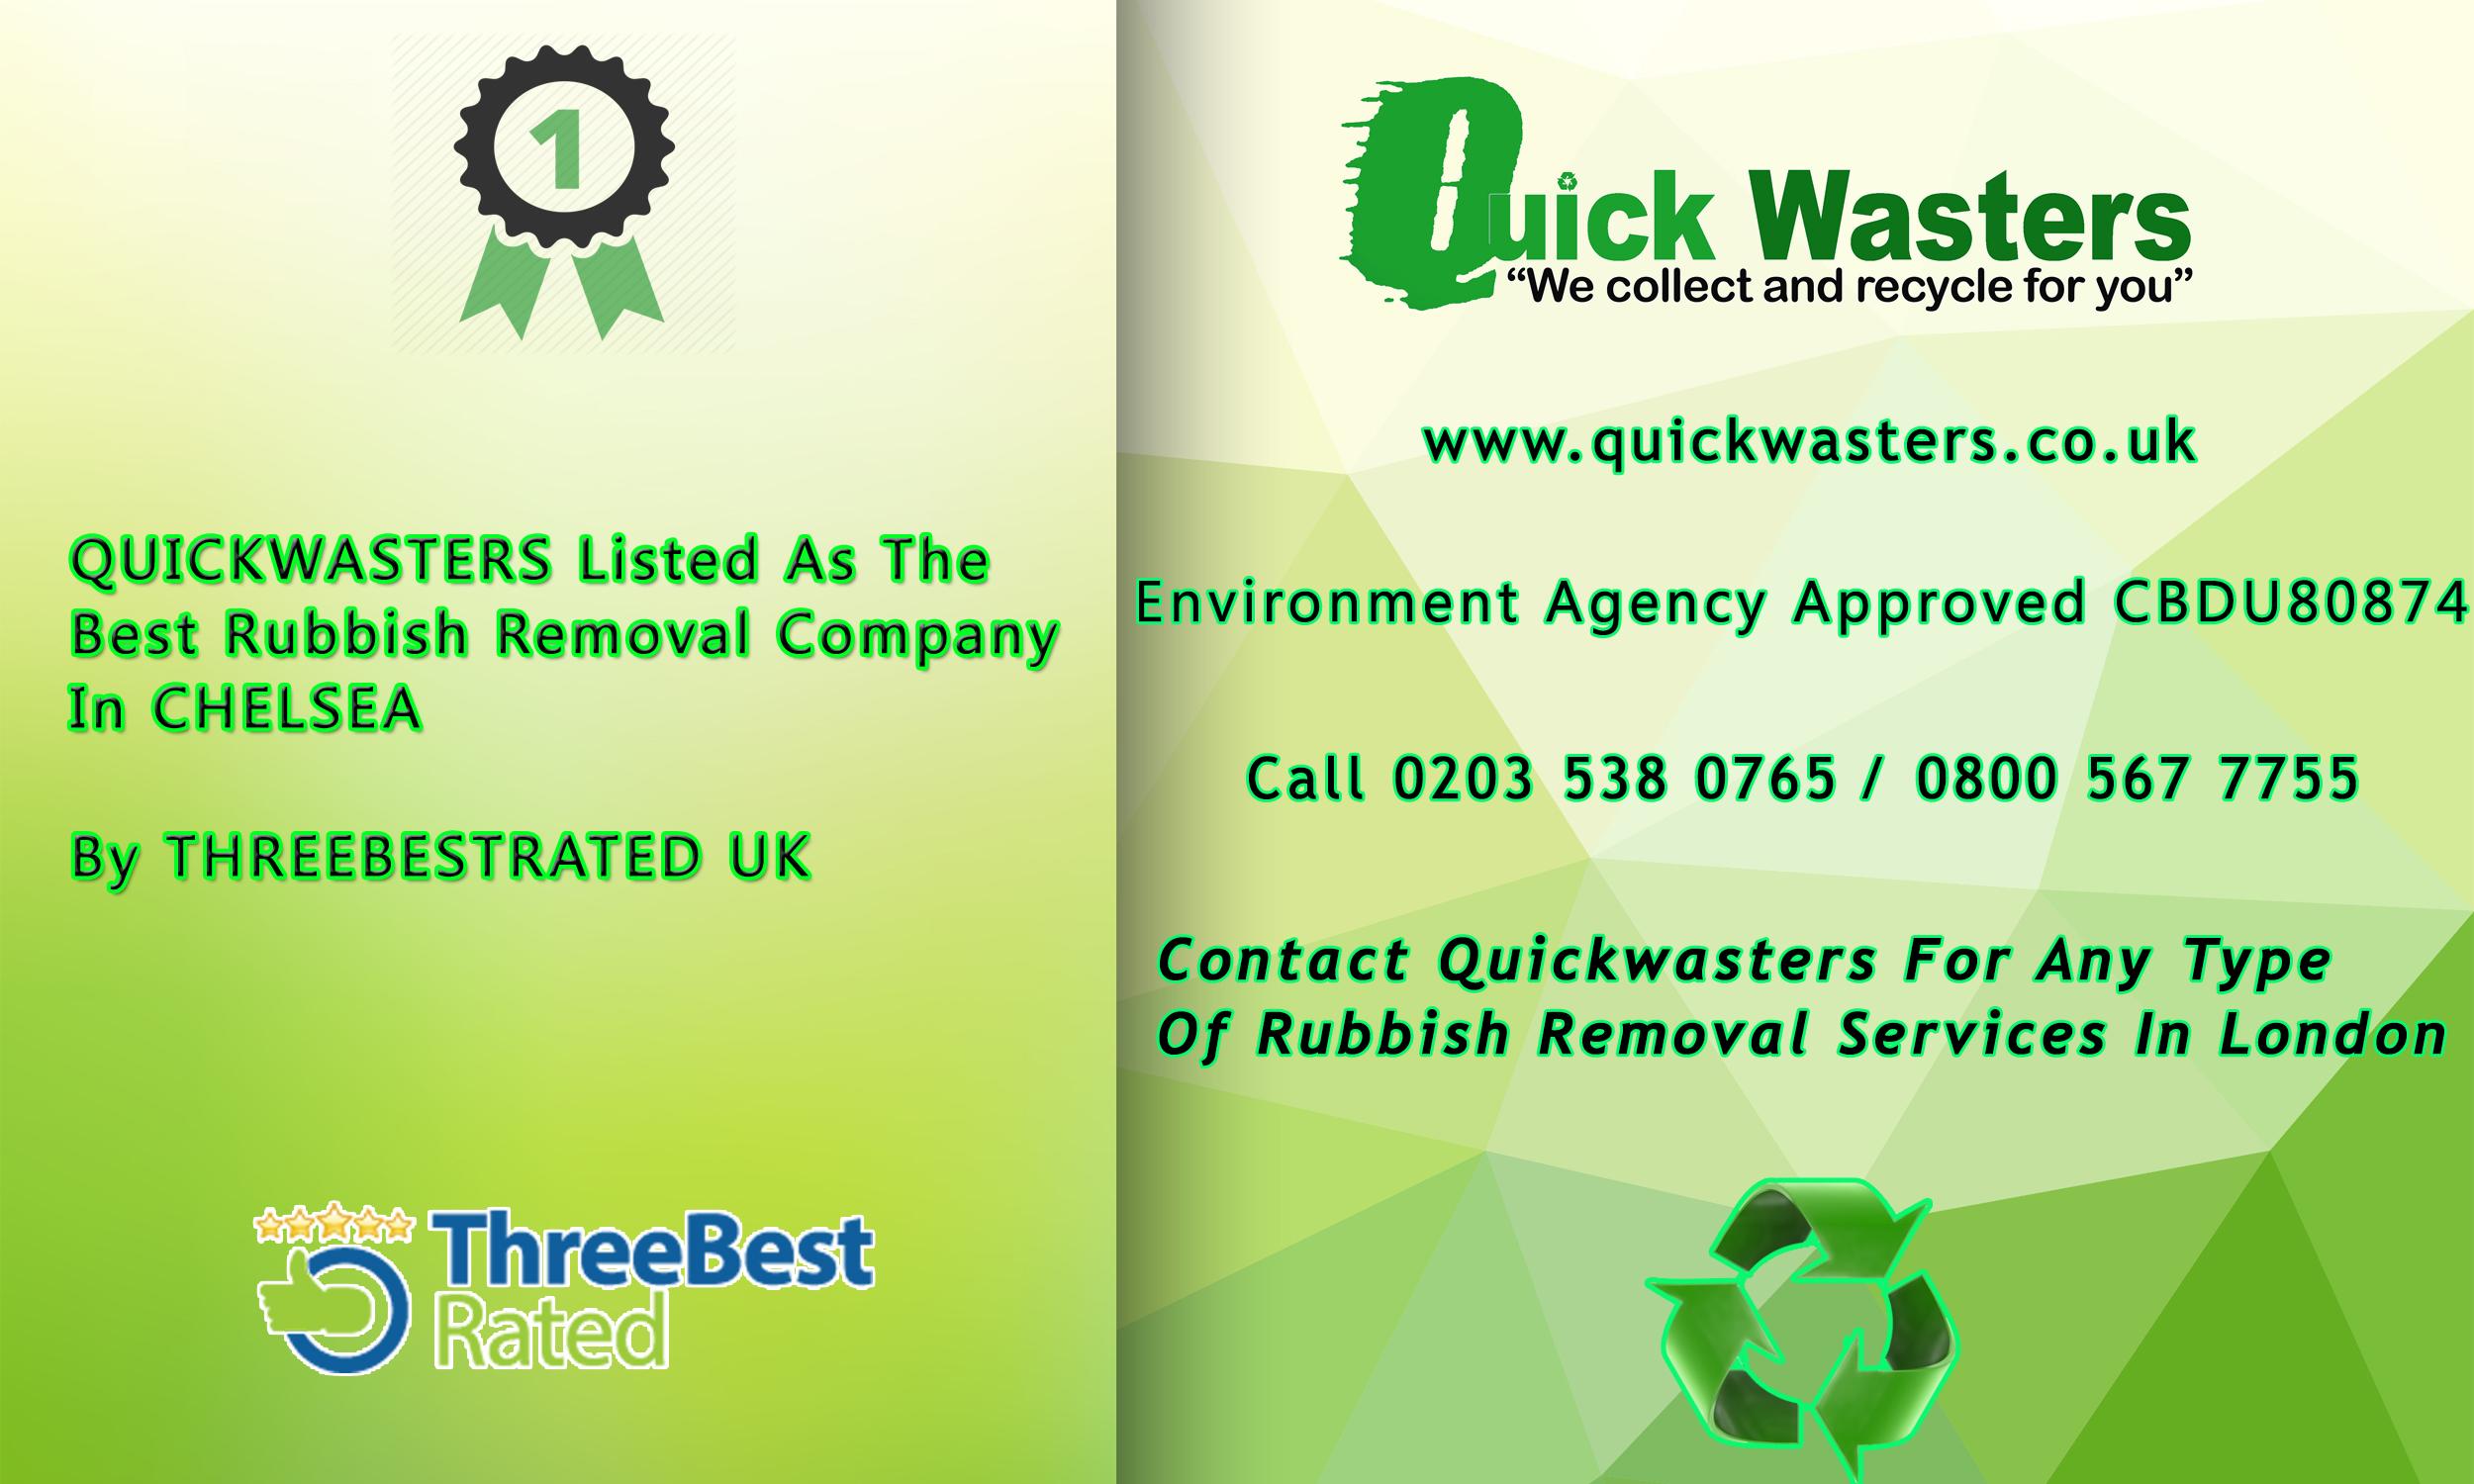 Quickwasters - Best In Chelsea